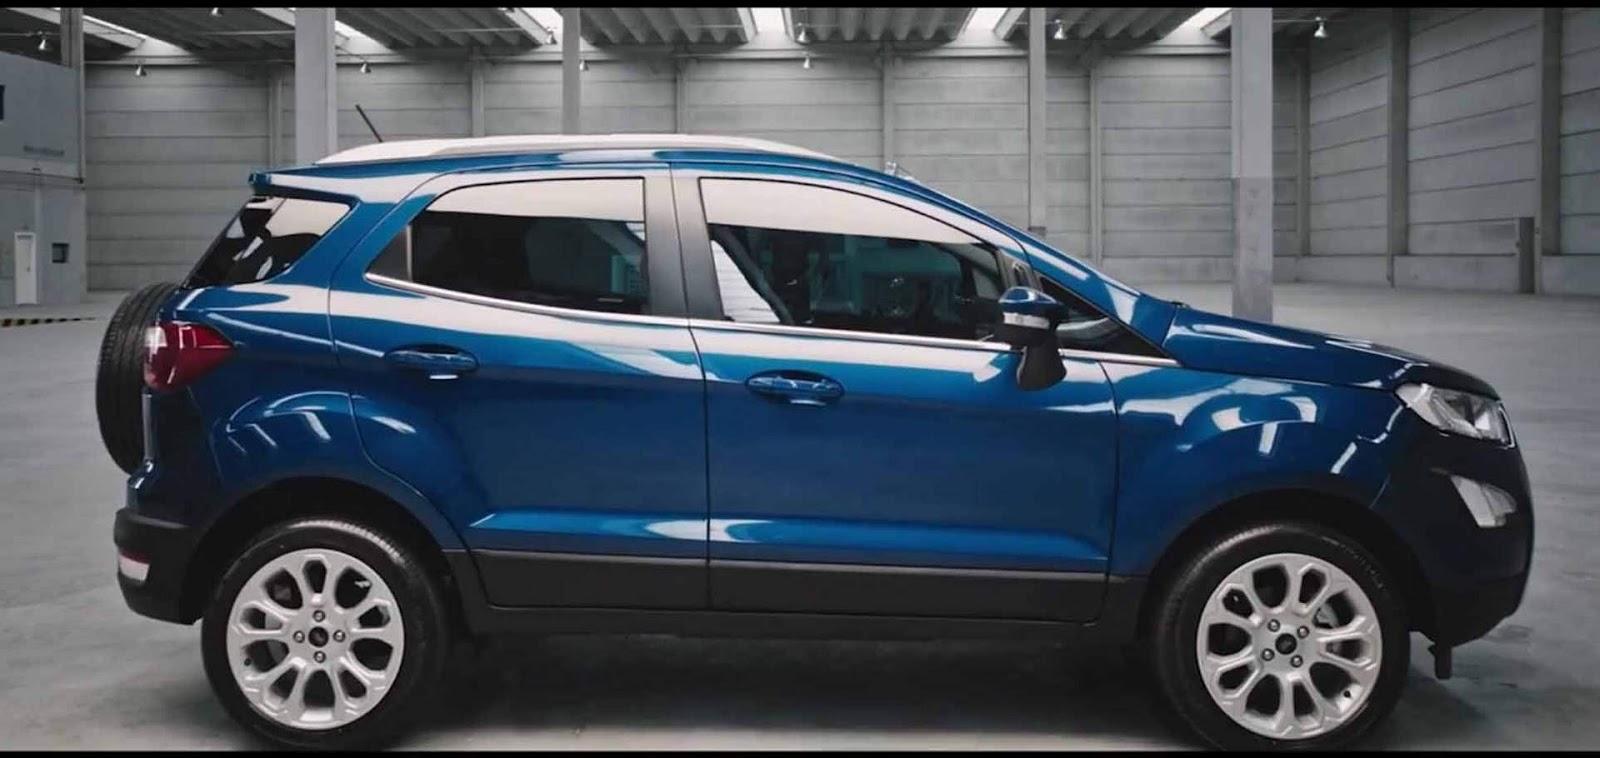 novo ford ecosport 2018 teaser oficial mostra detalhes car blog br. Black Bedroom Furniture Sets. Home Design Ideas